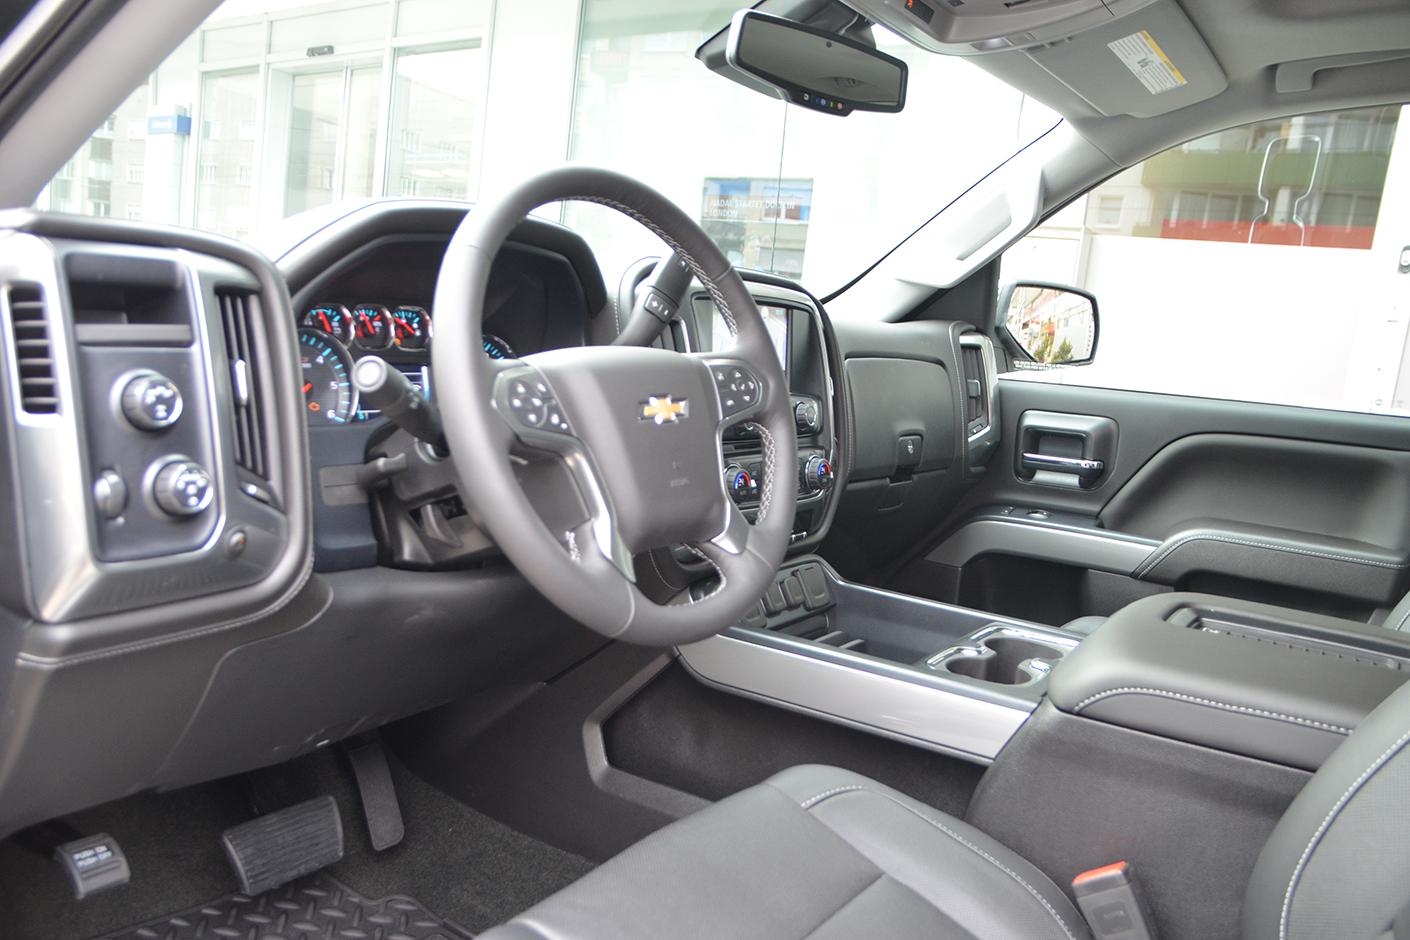 Chevrolet Silverado LTZ 2LZ Z71 2018-6